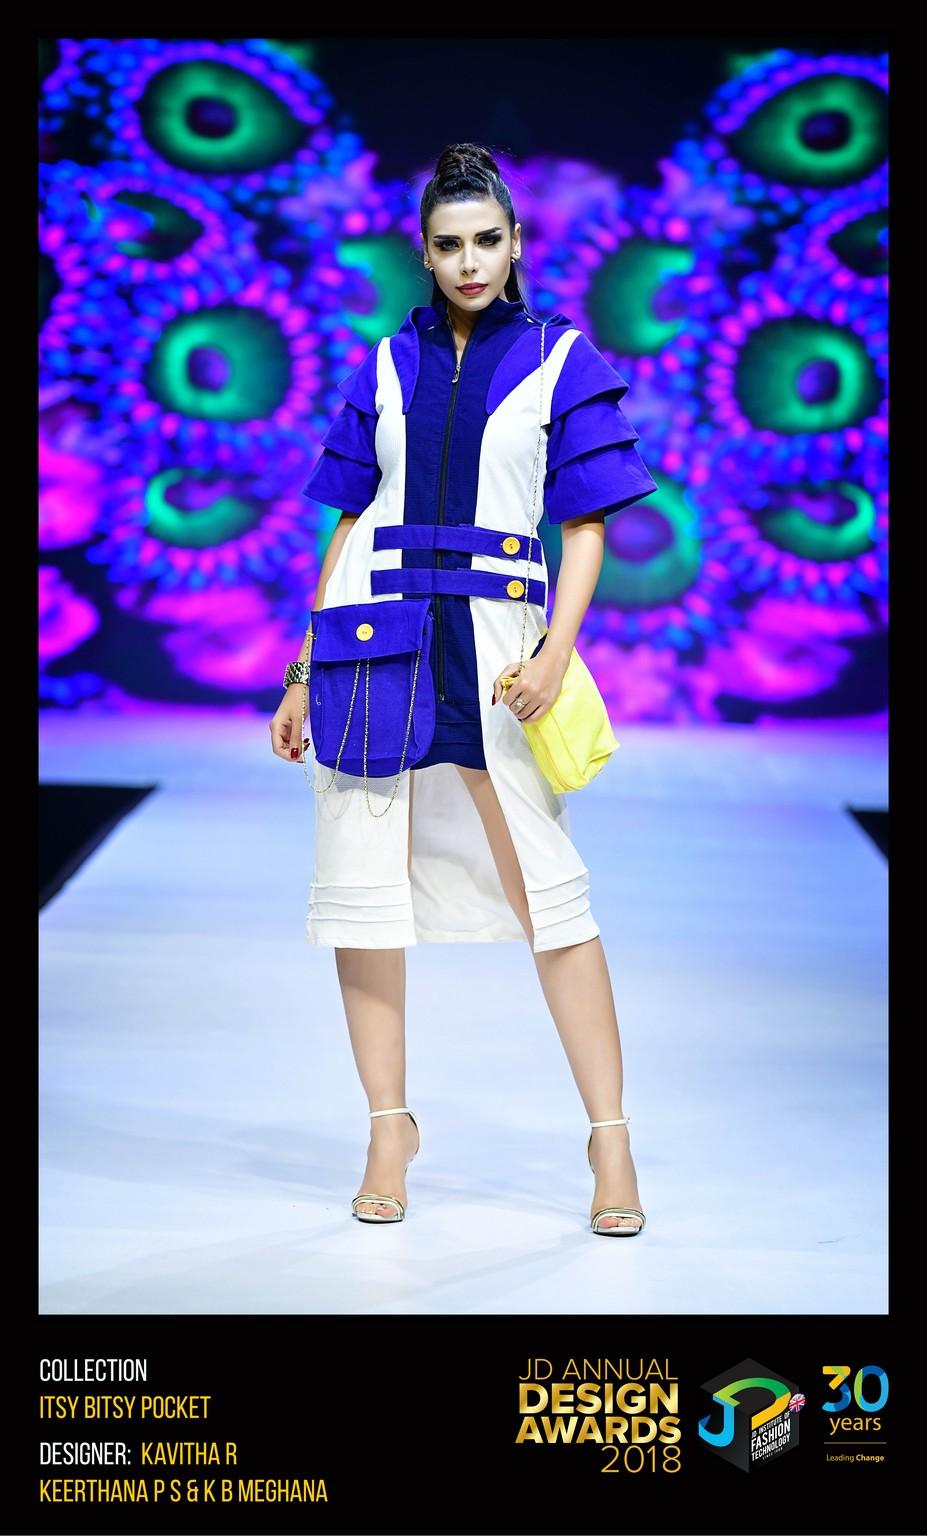 Itsy Bitsy Pocket Dress – Change – JD Annual Design Awards 2018   Designer: Kavitha, Keertana and Meghana   Photography : Jerin Nath (@jerin_nath) itsy bitsy pocket dress Itsy Bitsy Pocket Dress – Change – JD Annual Design Awards 2018 ITSY BITSY POCKET7